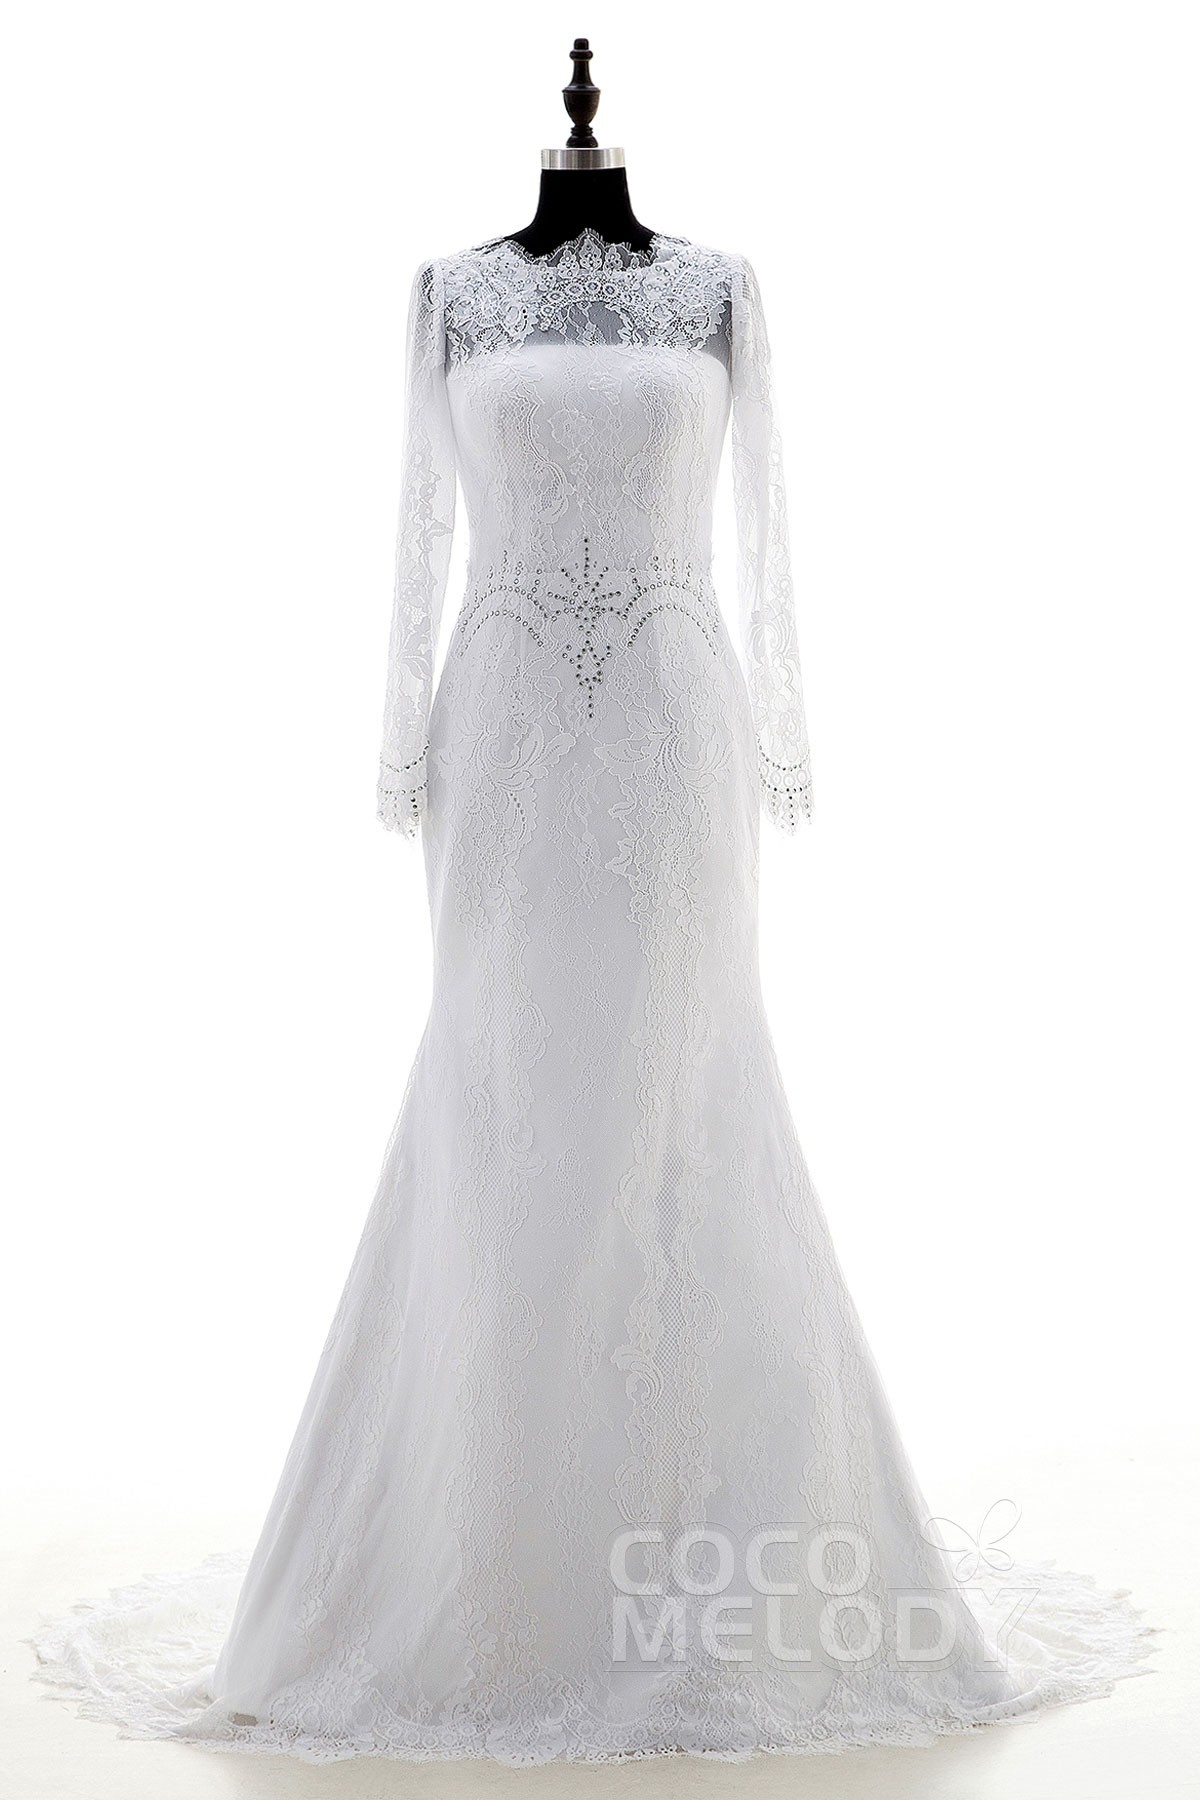 Sheath-Column Lace Long Sleeve Wedding Dress LD3876 | Cocomelody